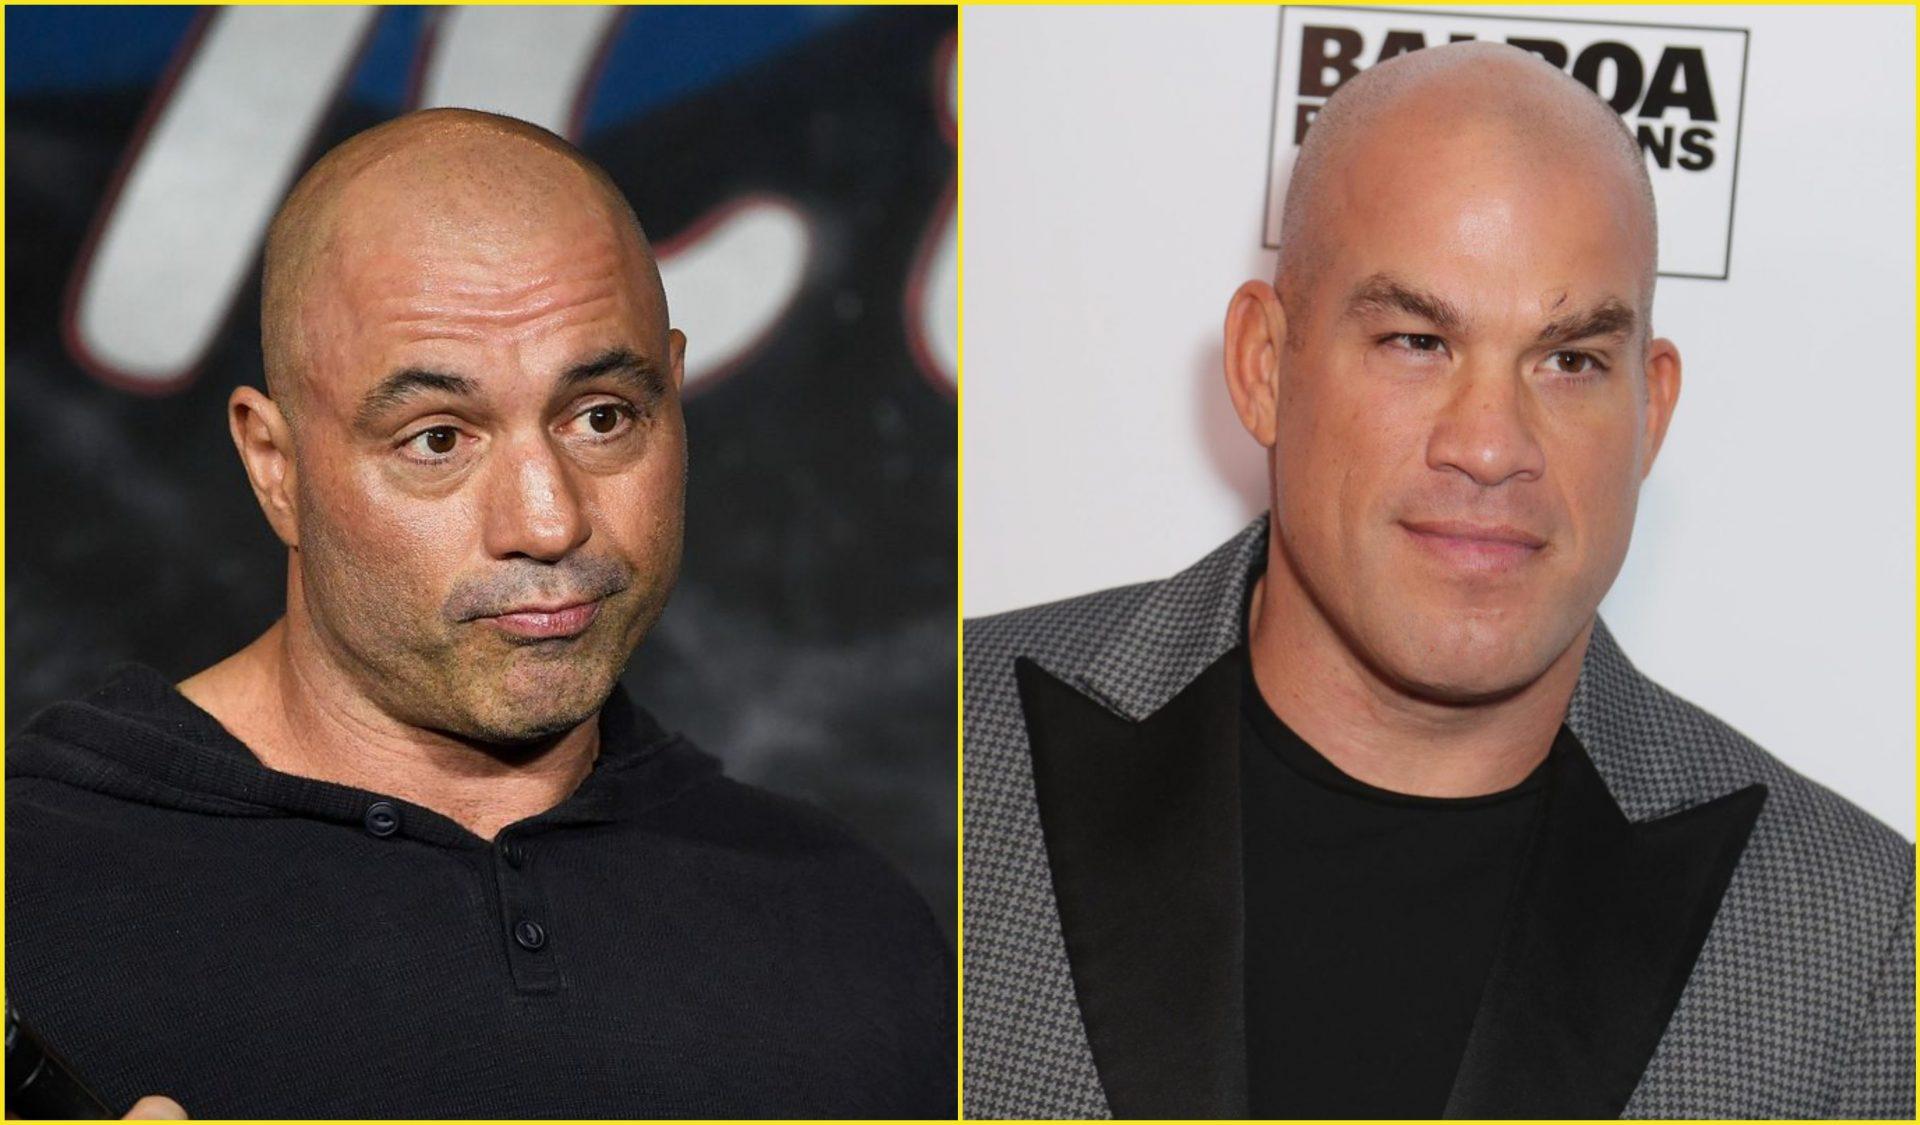 Tito Ortiz calls Joe Rogan a Quitter for leaving California - Rogan